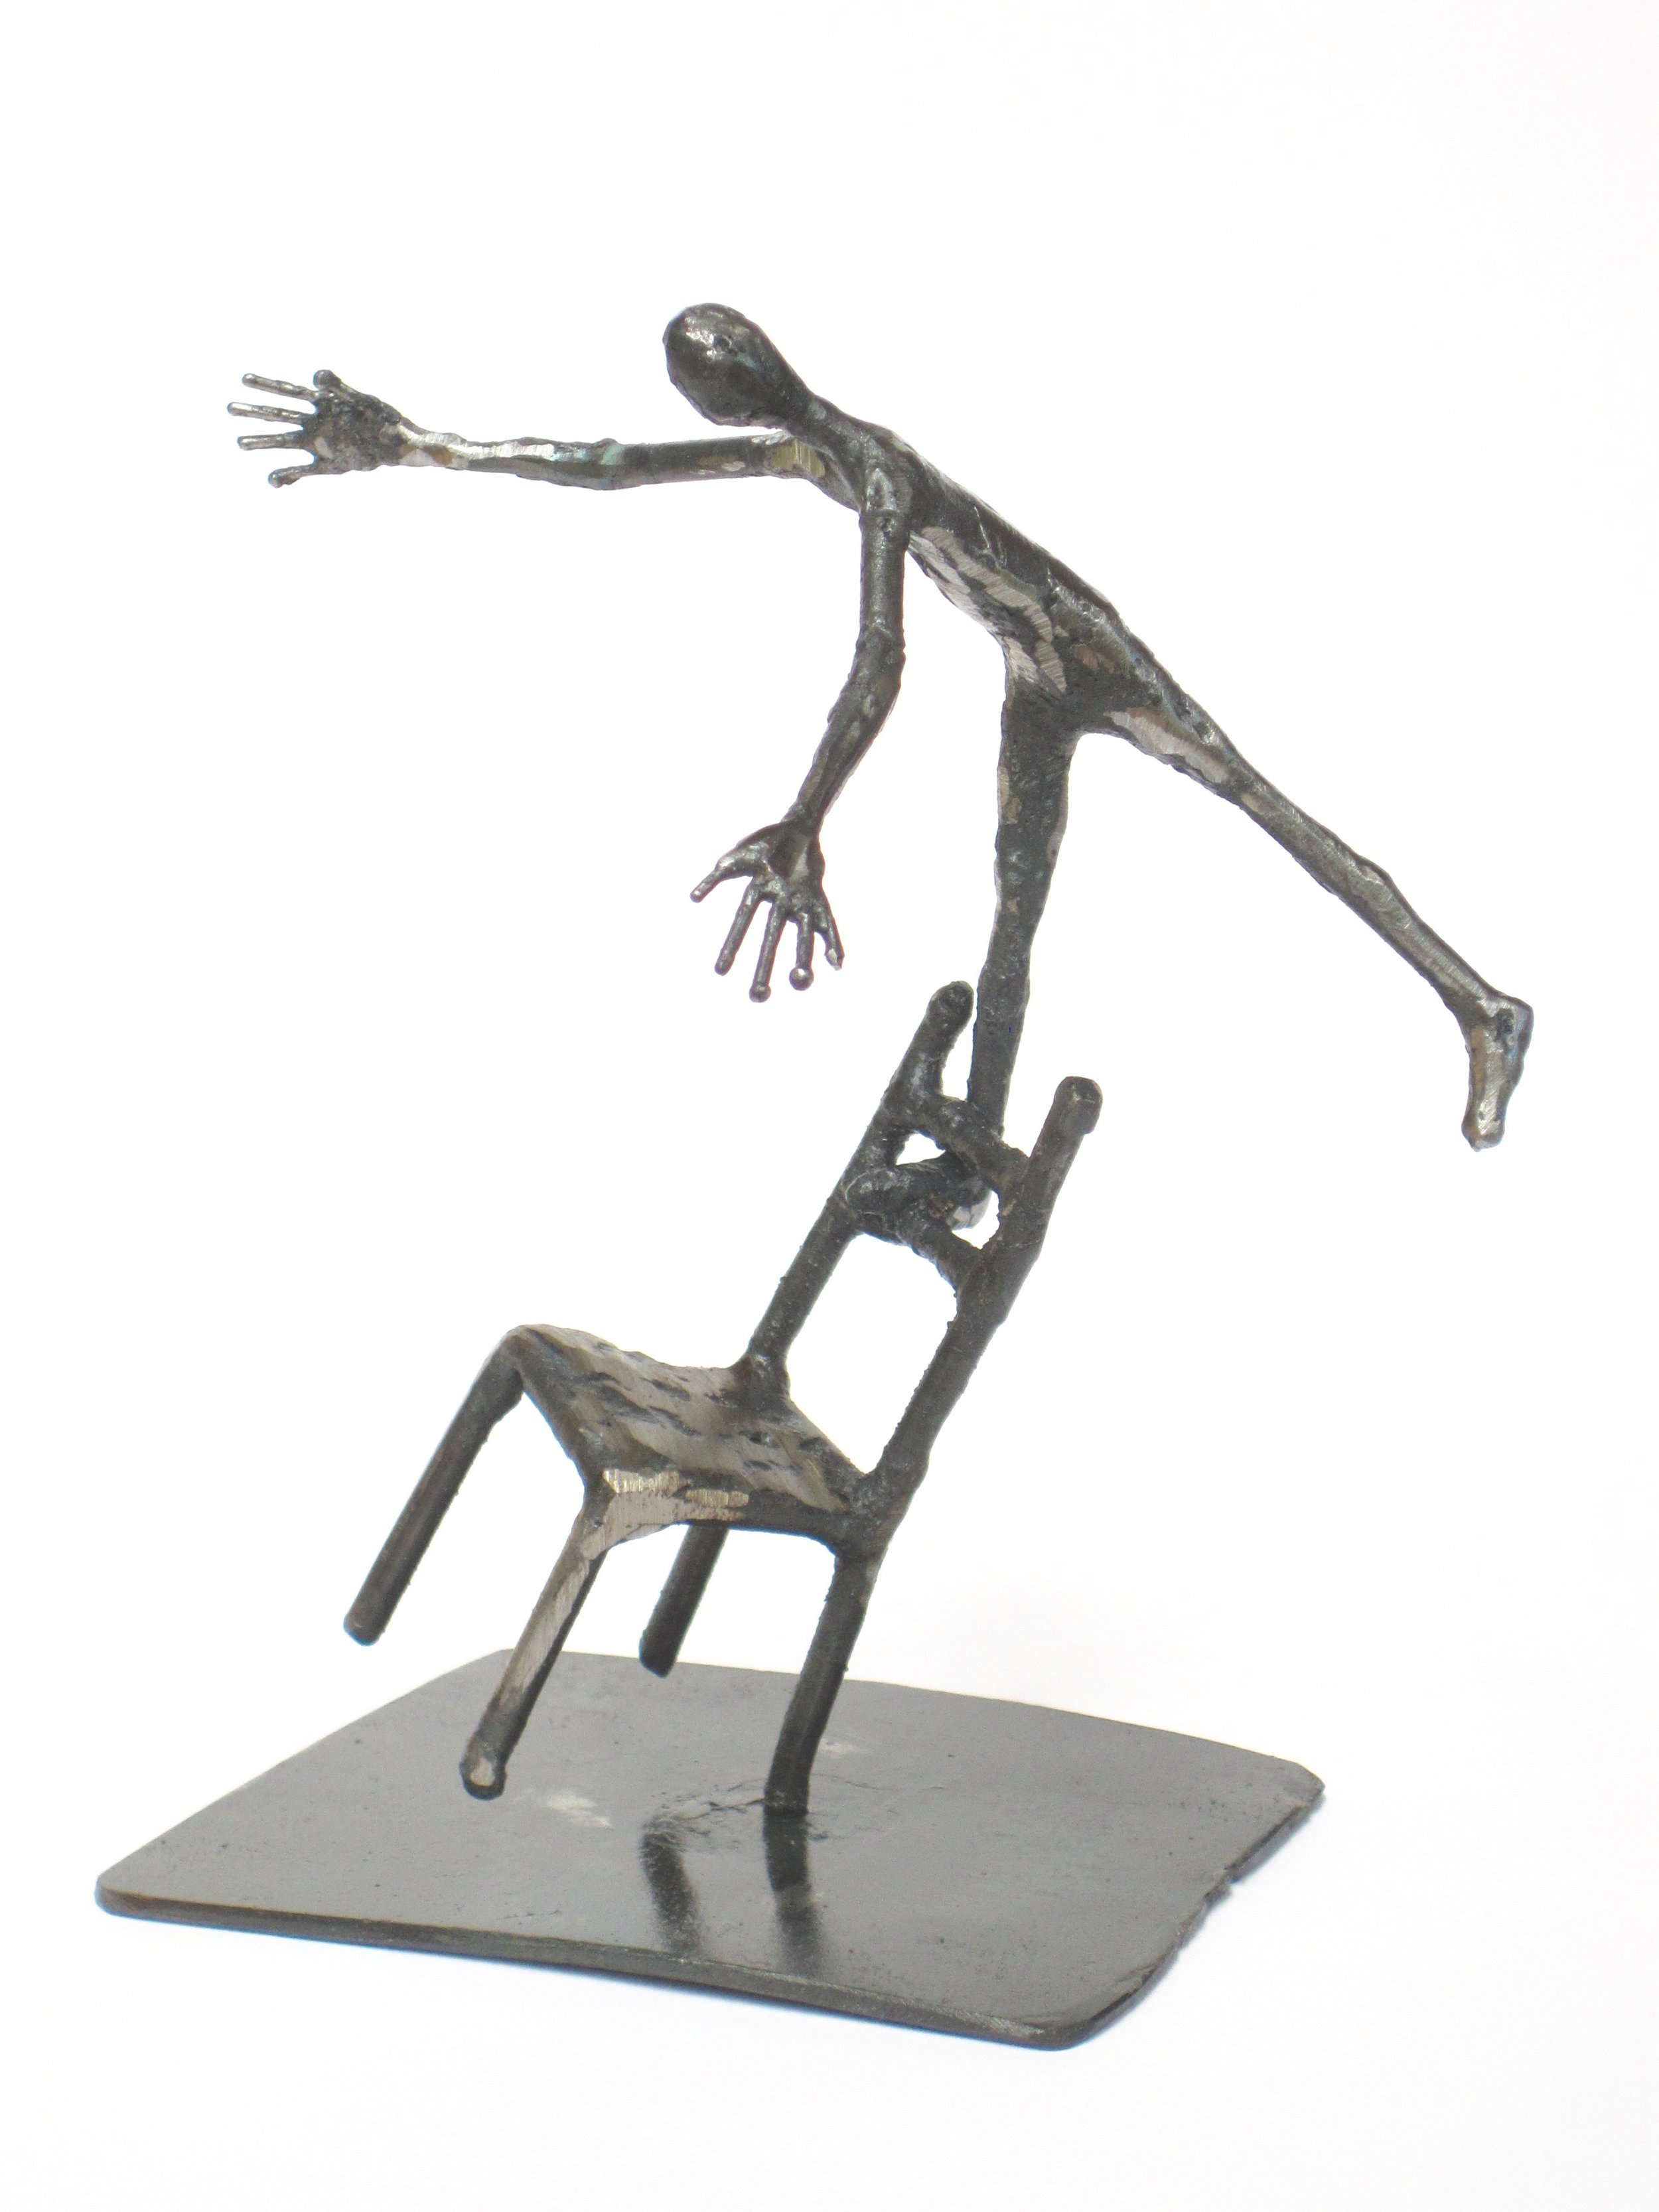 "*Chair Balancer, 5 x 3 x4"""